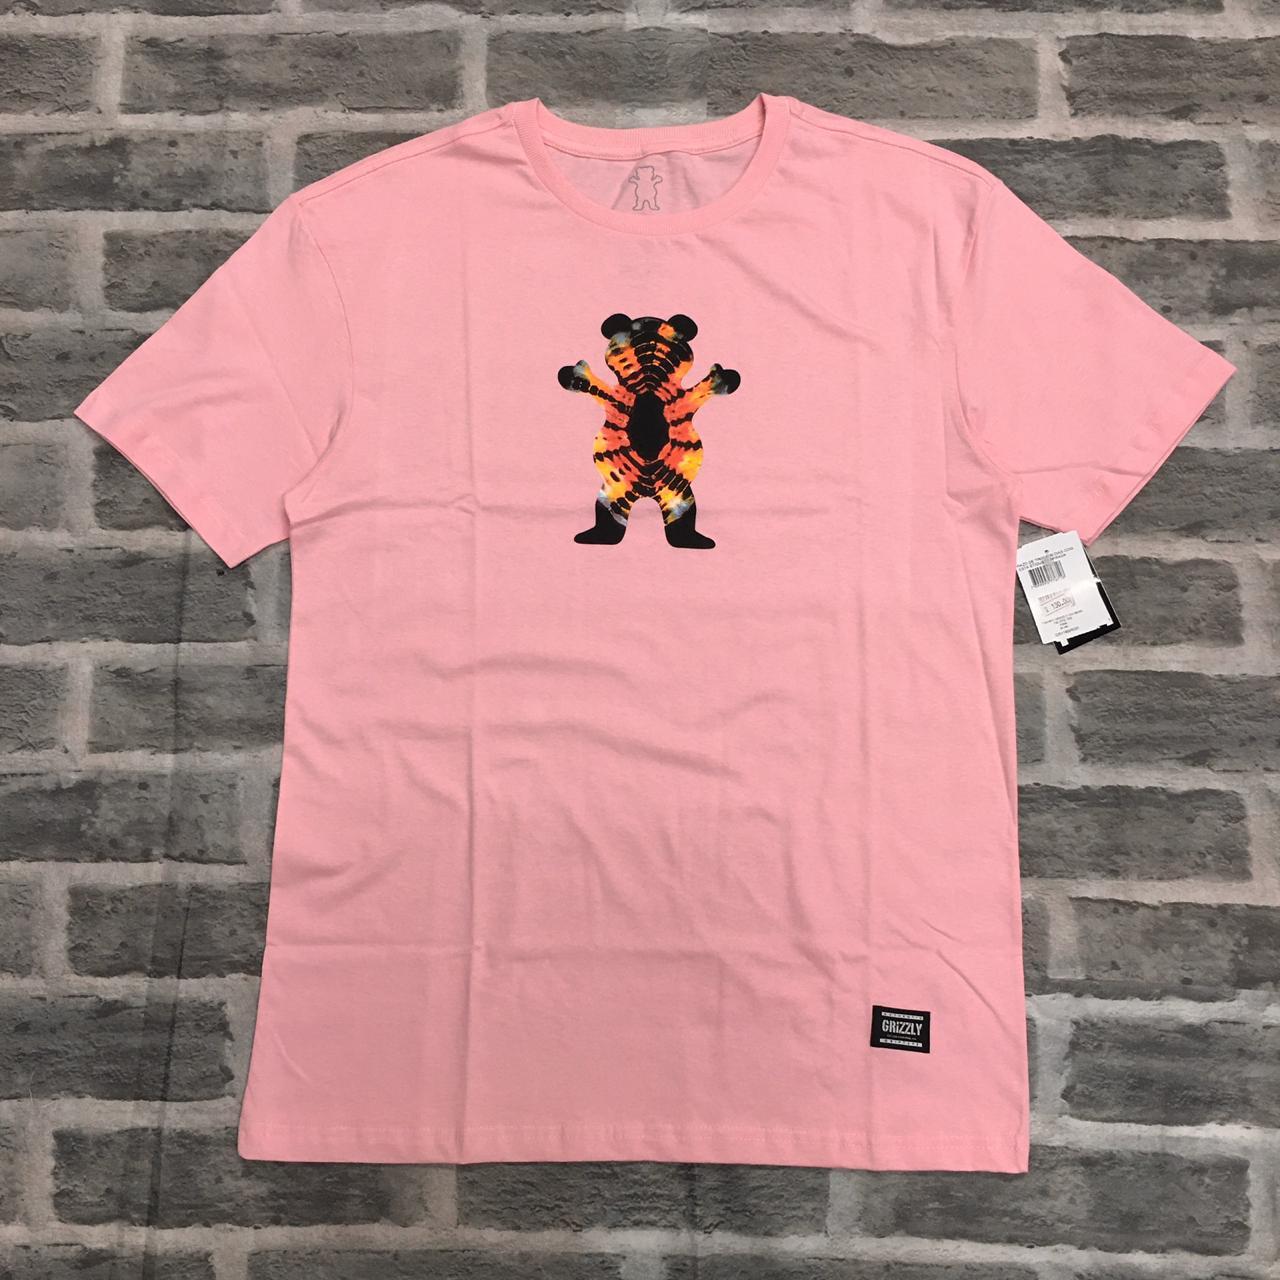 Camiseta Grizzly Og beat tie dye tee rosa